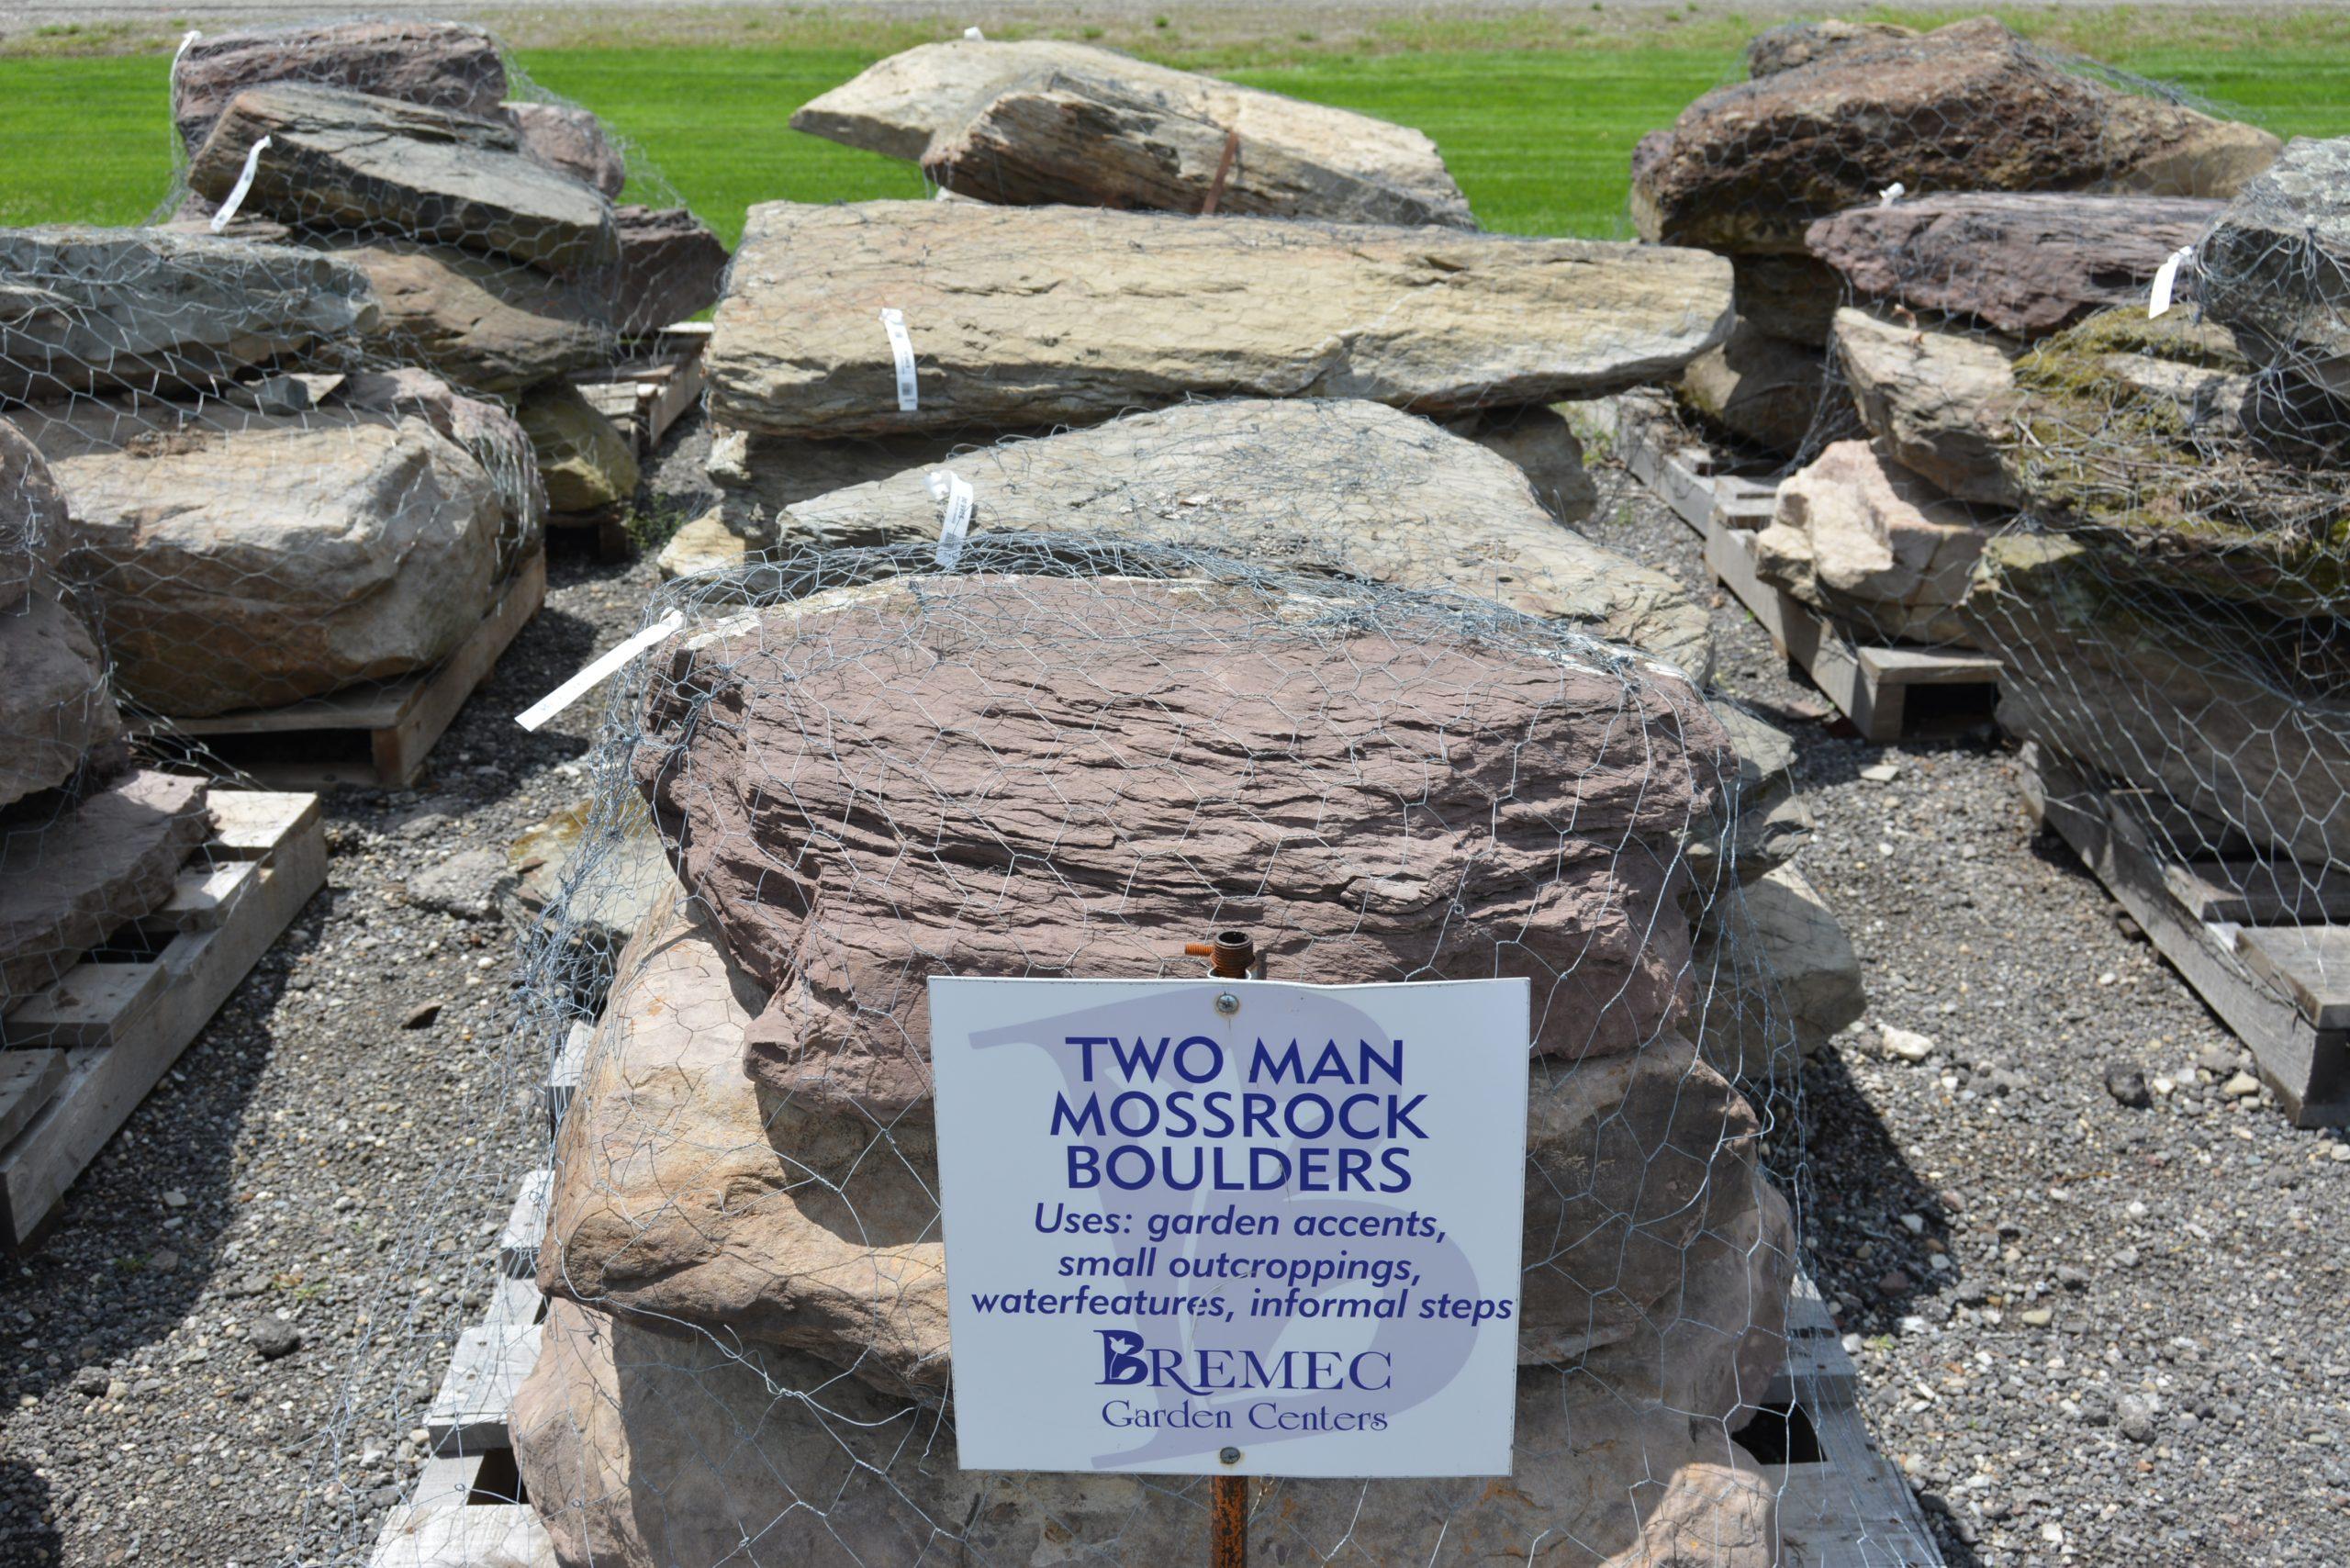 Two Man Moss Rock Boulders